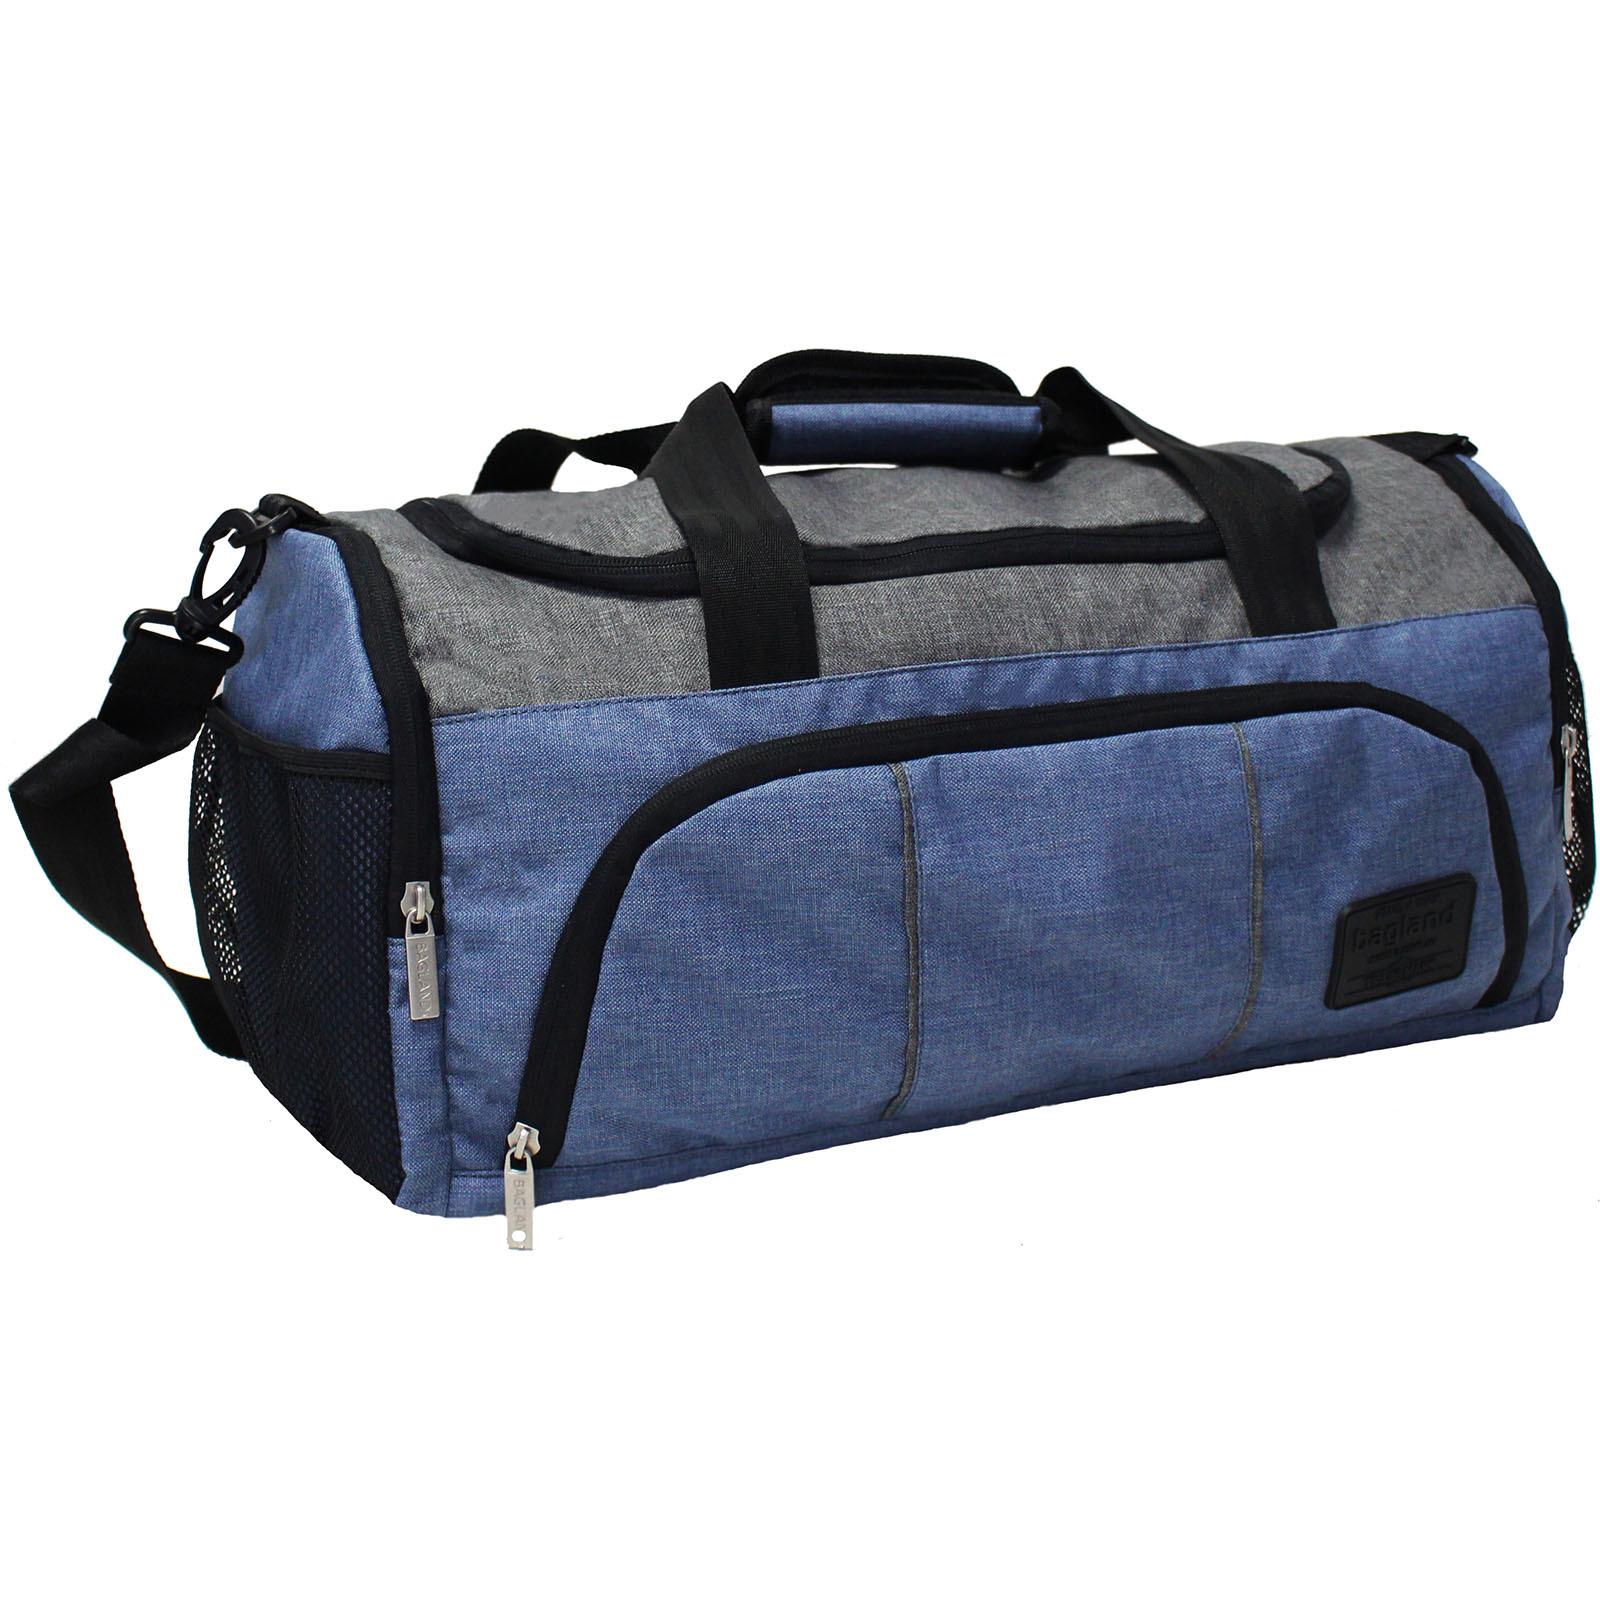 Спортивные сумки Сумка Bagland Bloom 30 л. Синий/серый (0030869) IMG_0911.JPG